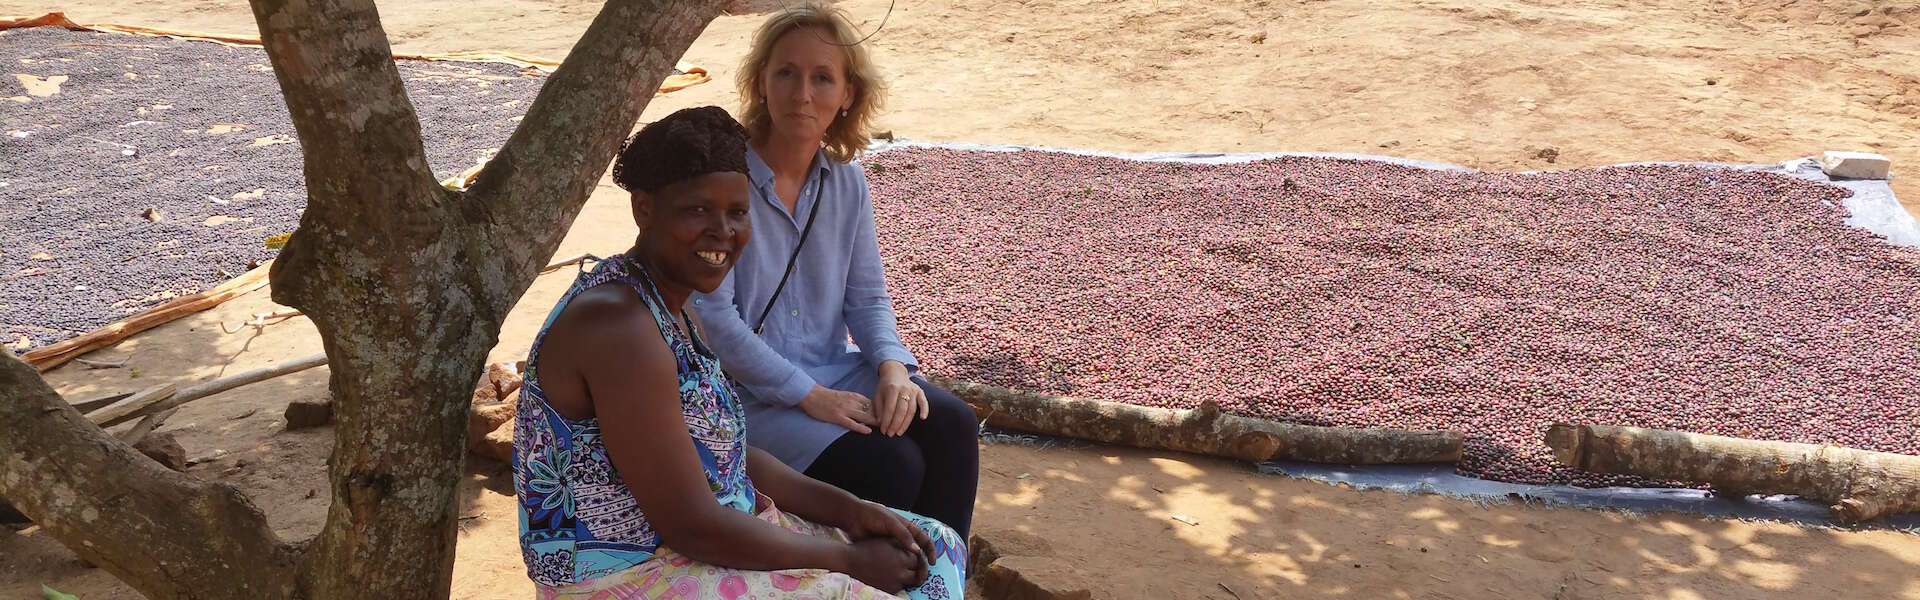 10 Developments Shaping Smallholder Finance in Africa, on NextBillion.net